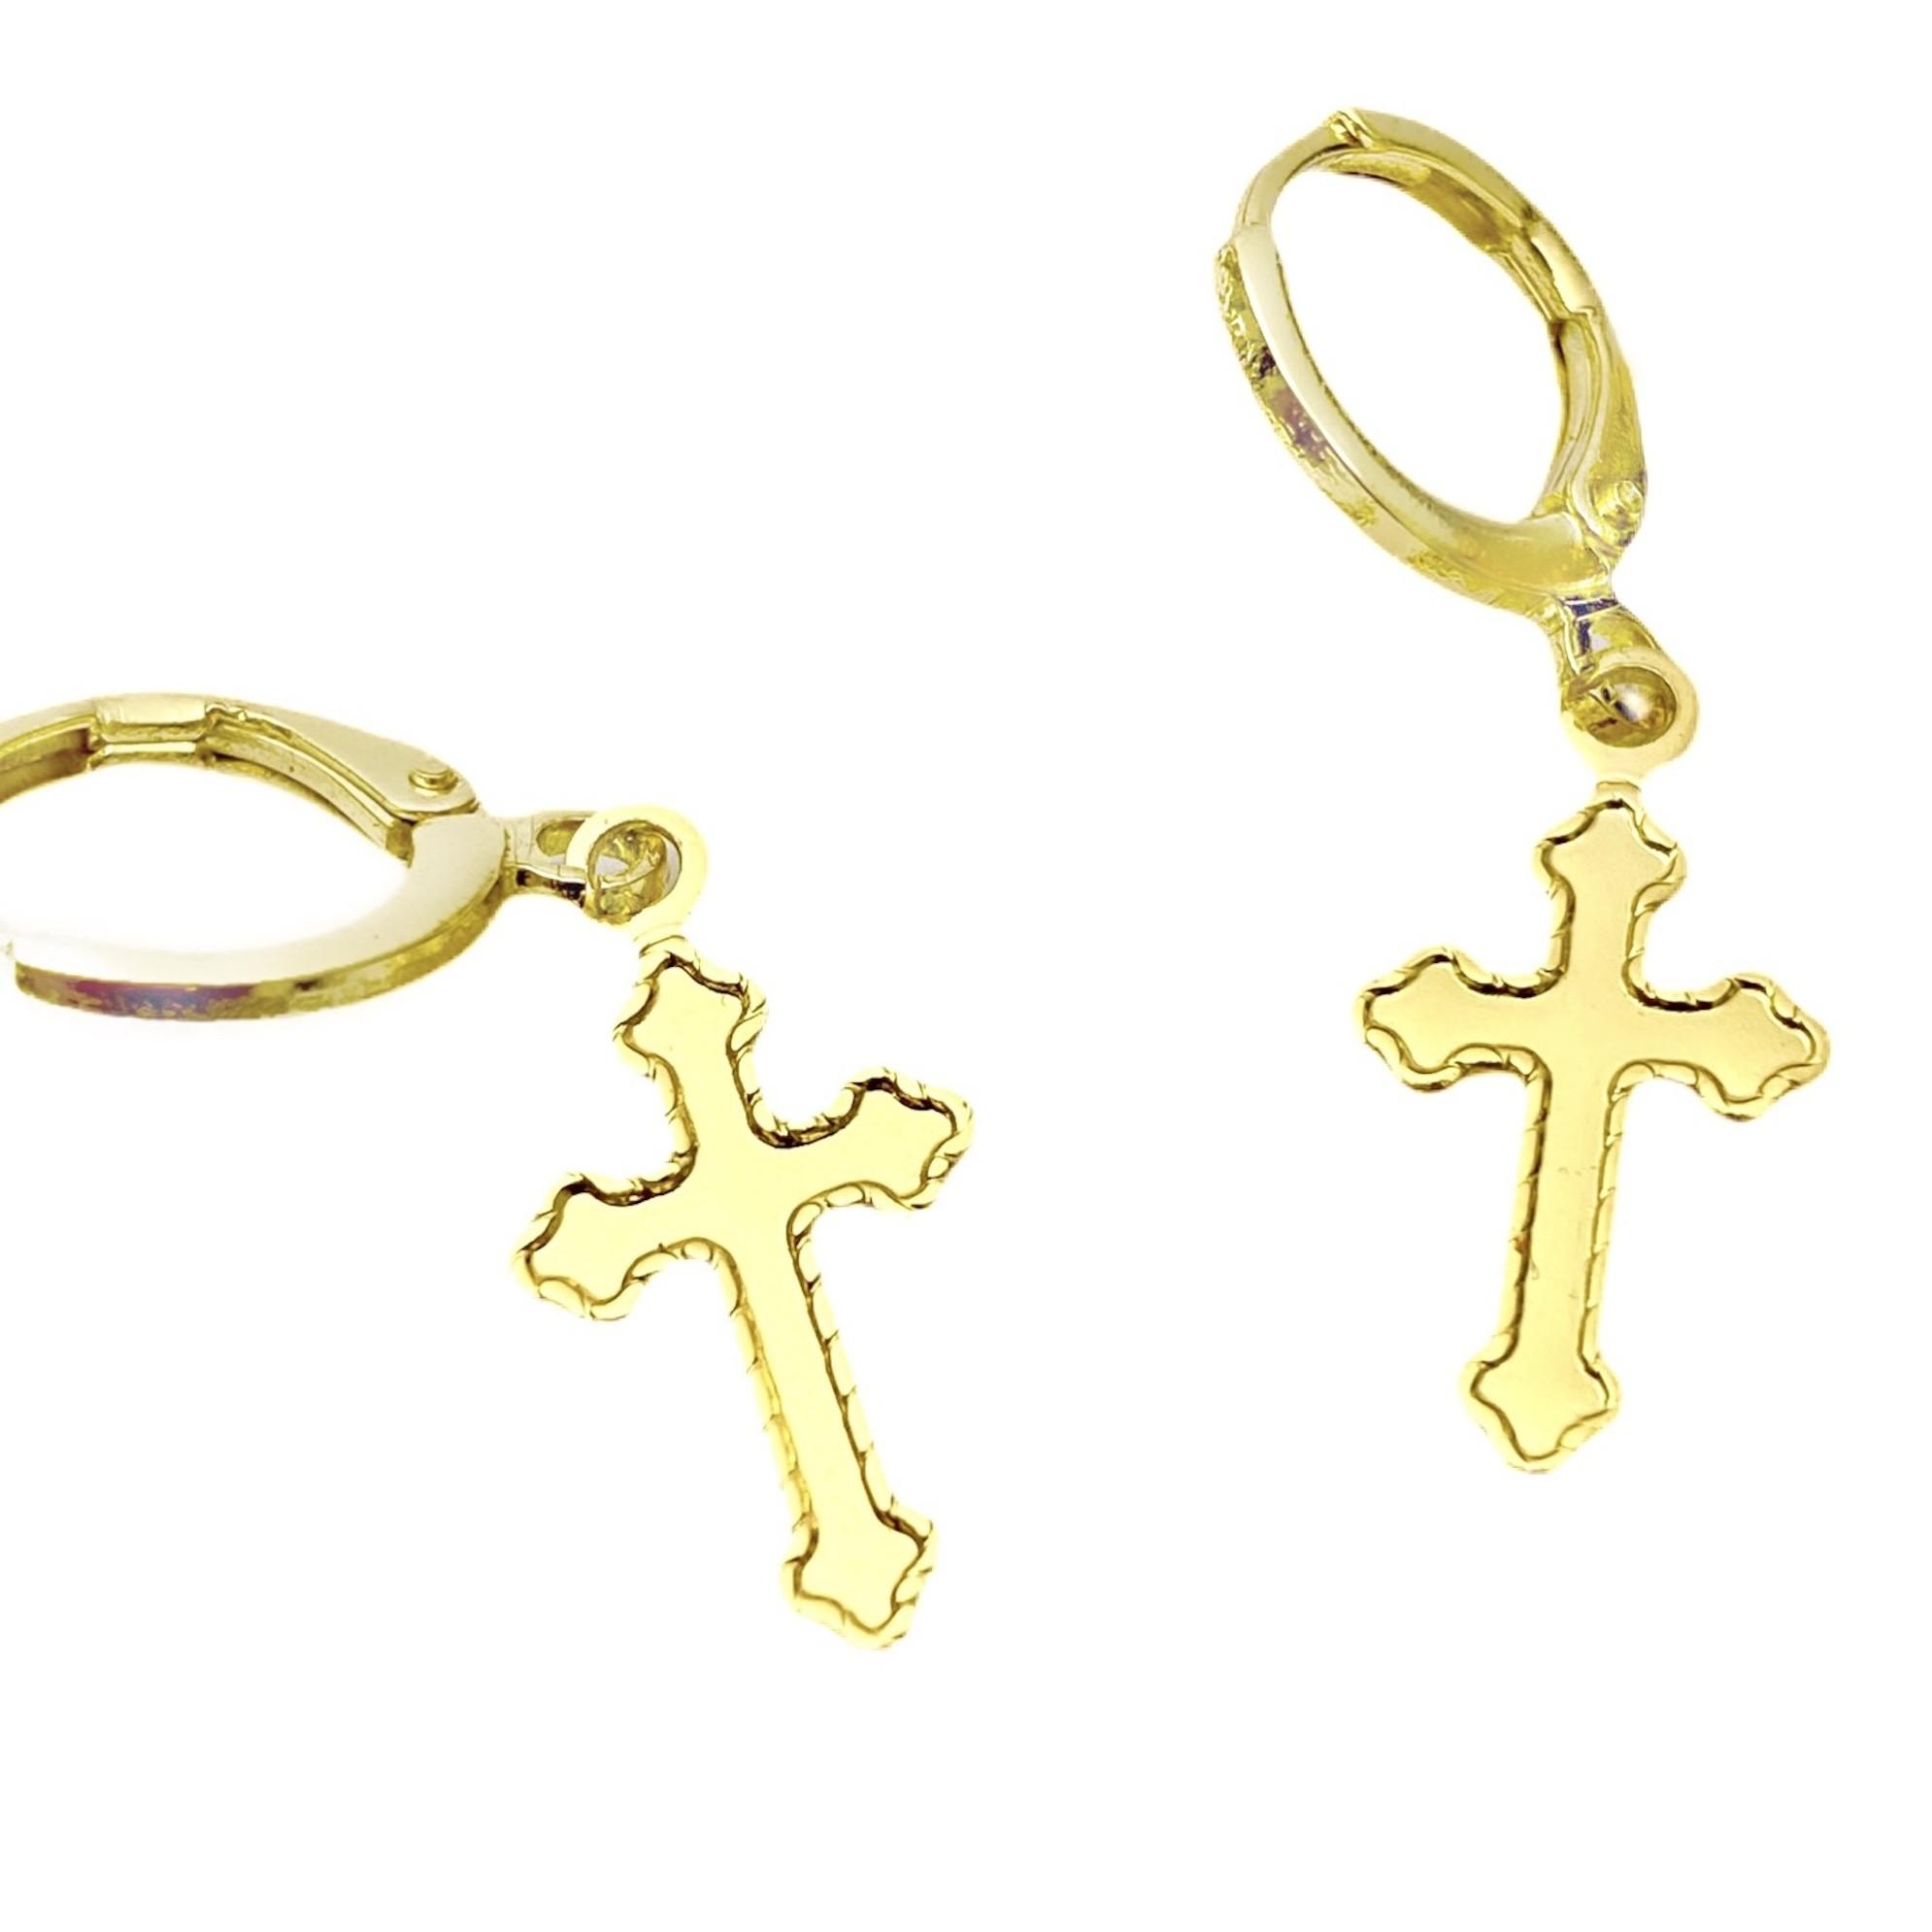 Brinco Argola Crucifixo (Banho Ouro 24K)